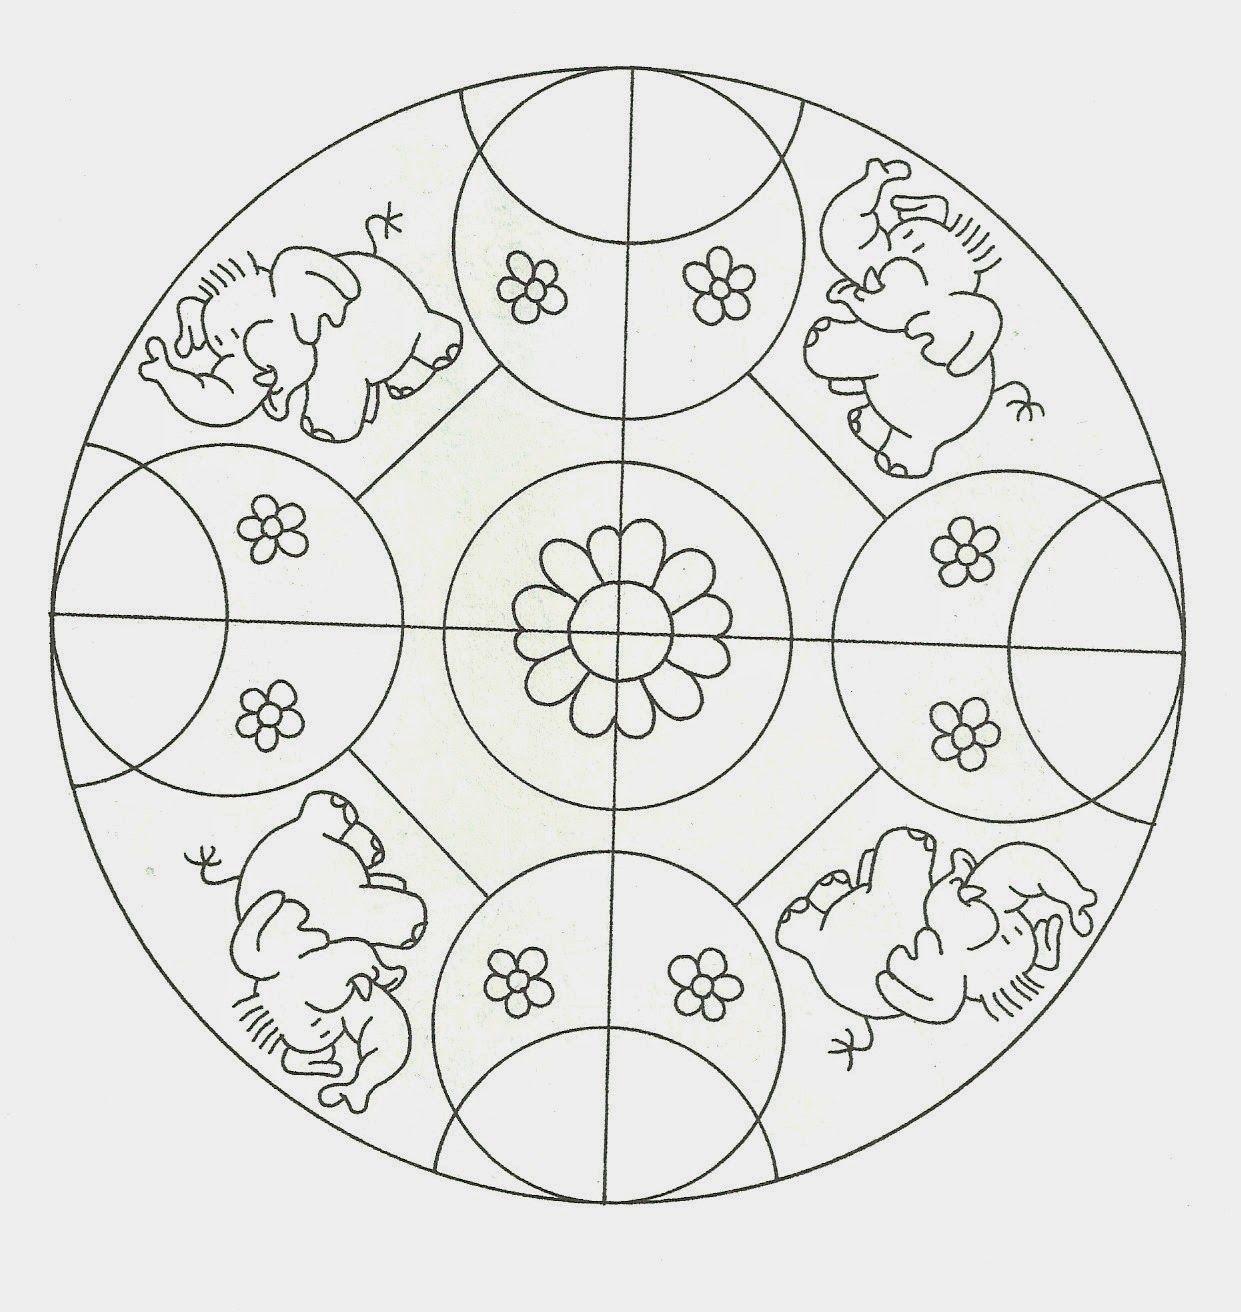 Mandalas Para Colorear Mandalas De Profesiones Mandalas Para Colorear Mandalas Mandalas Para Pintar Faciles